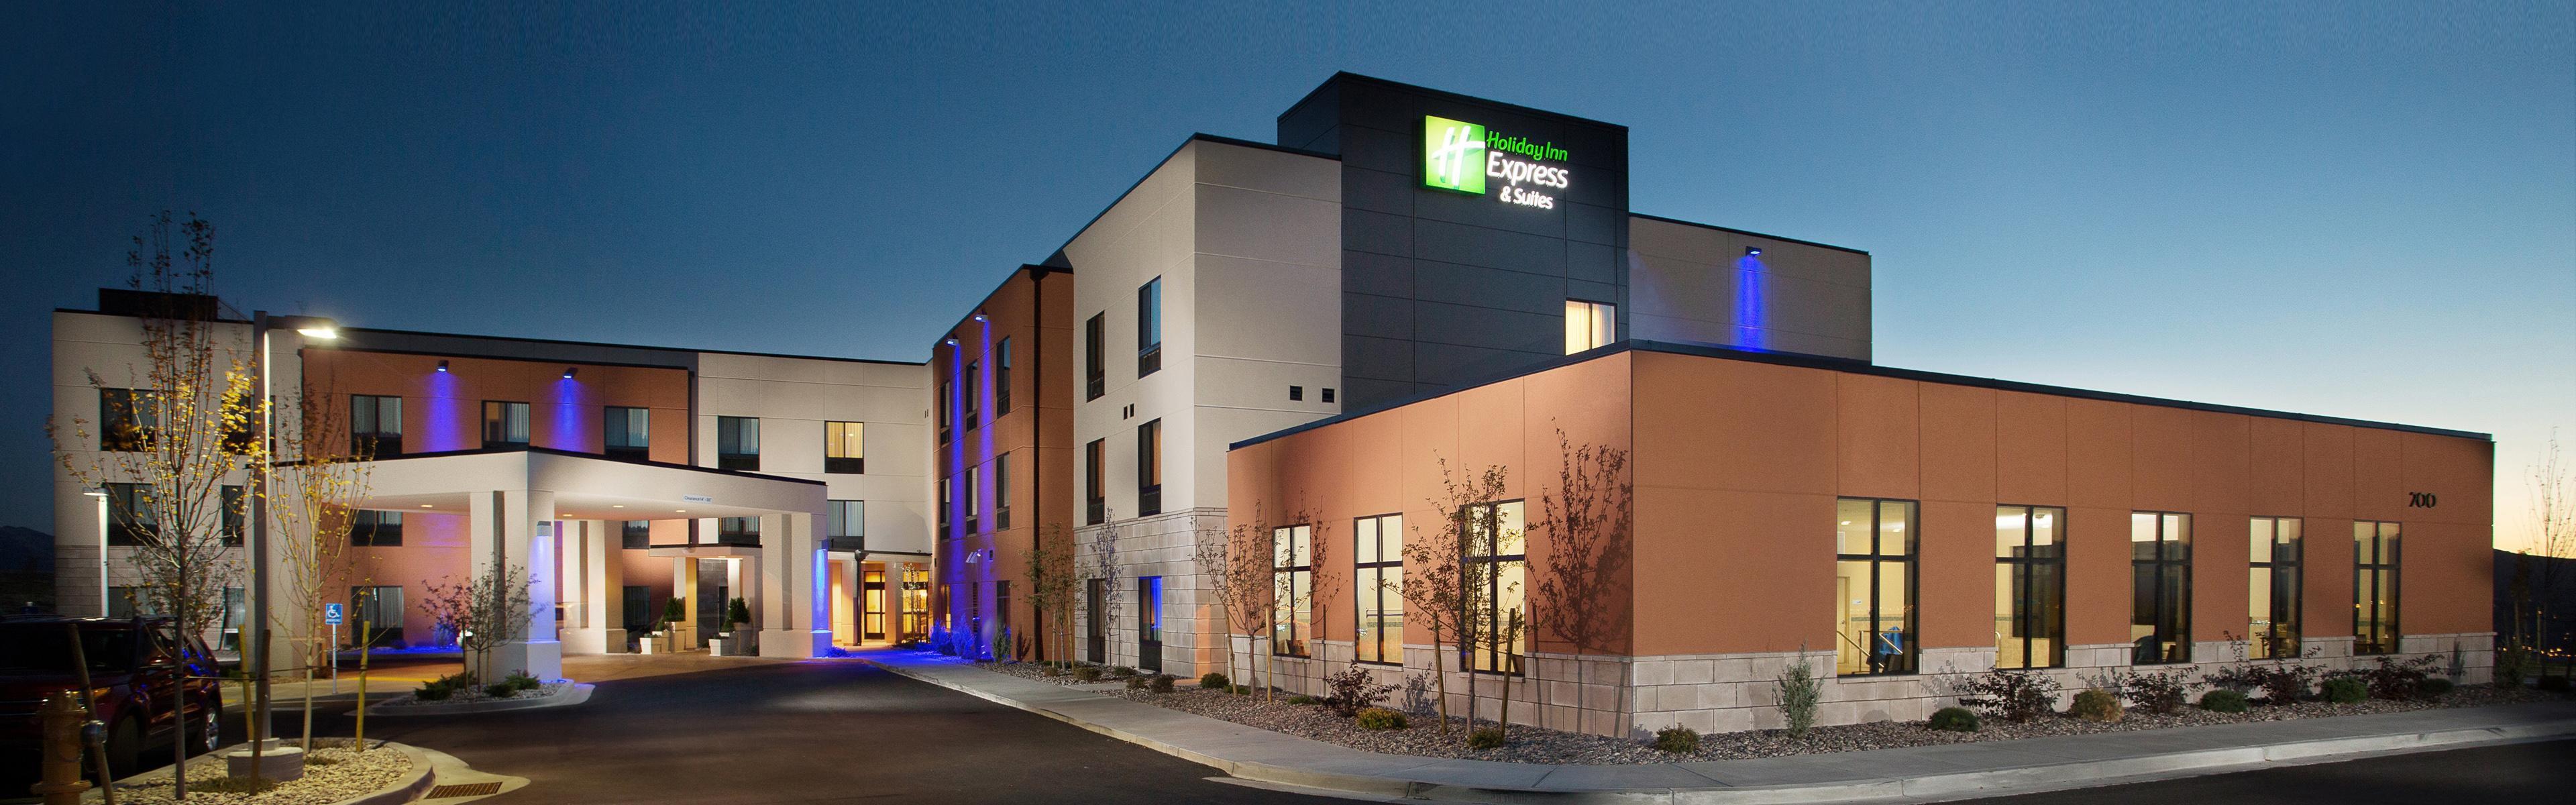 Holiday Inn Express & Suites Pocatello image 0